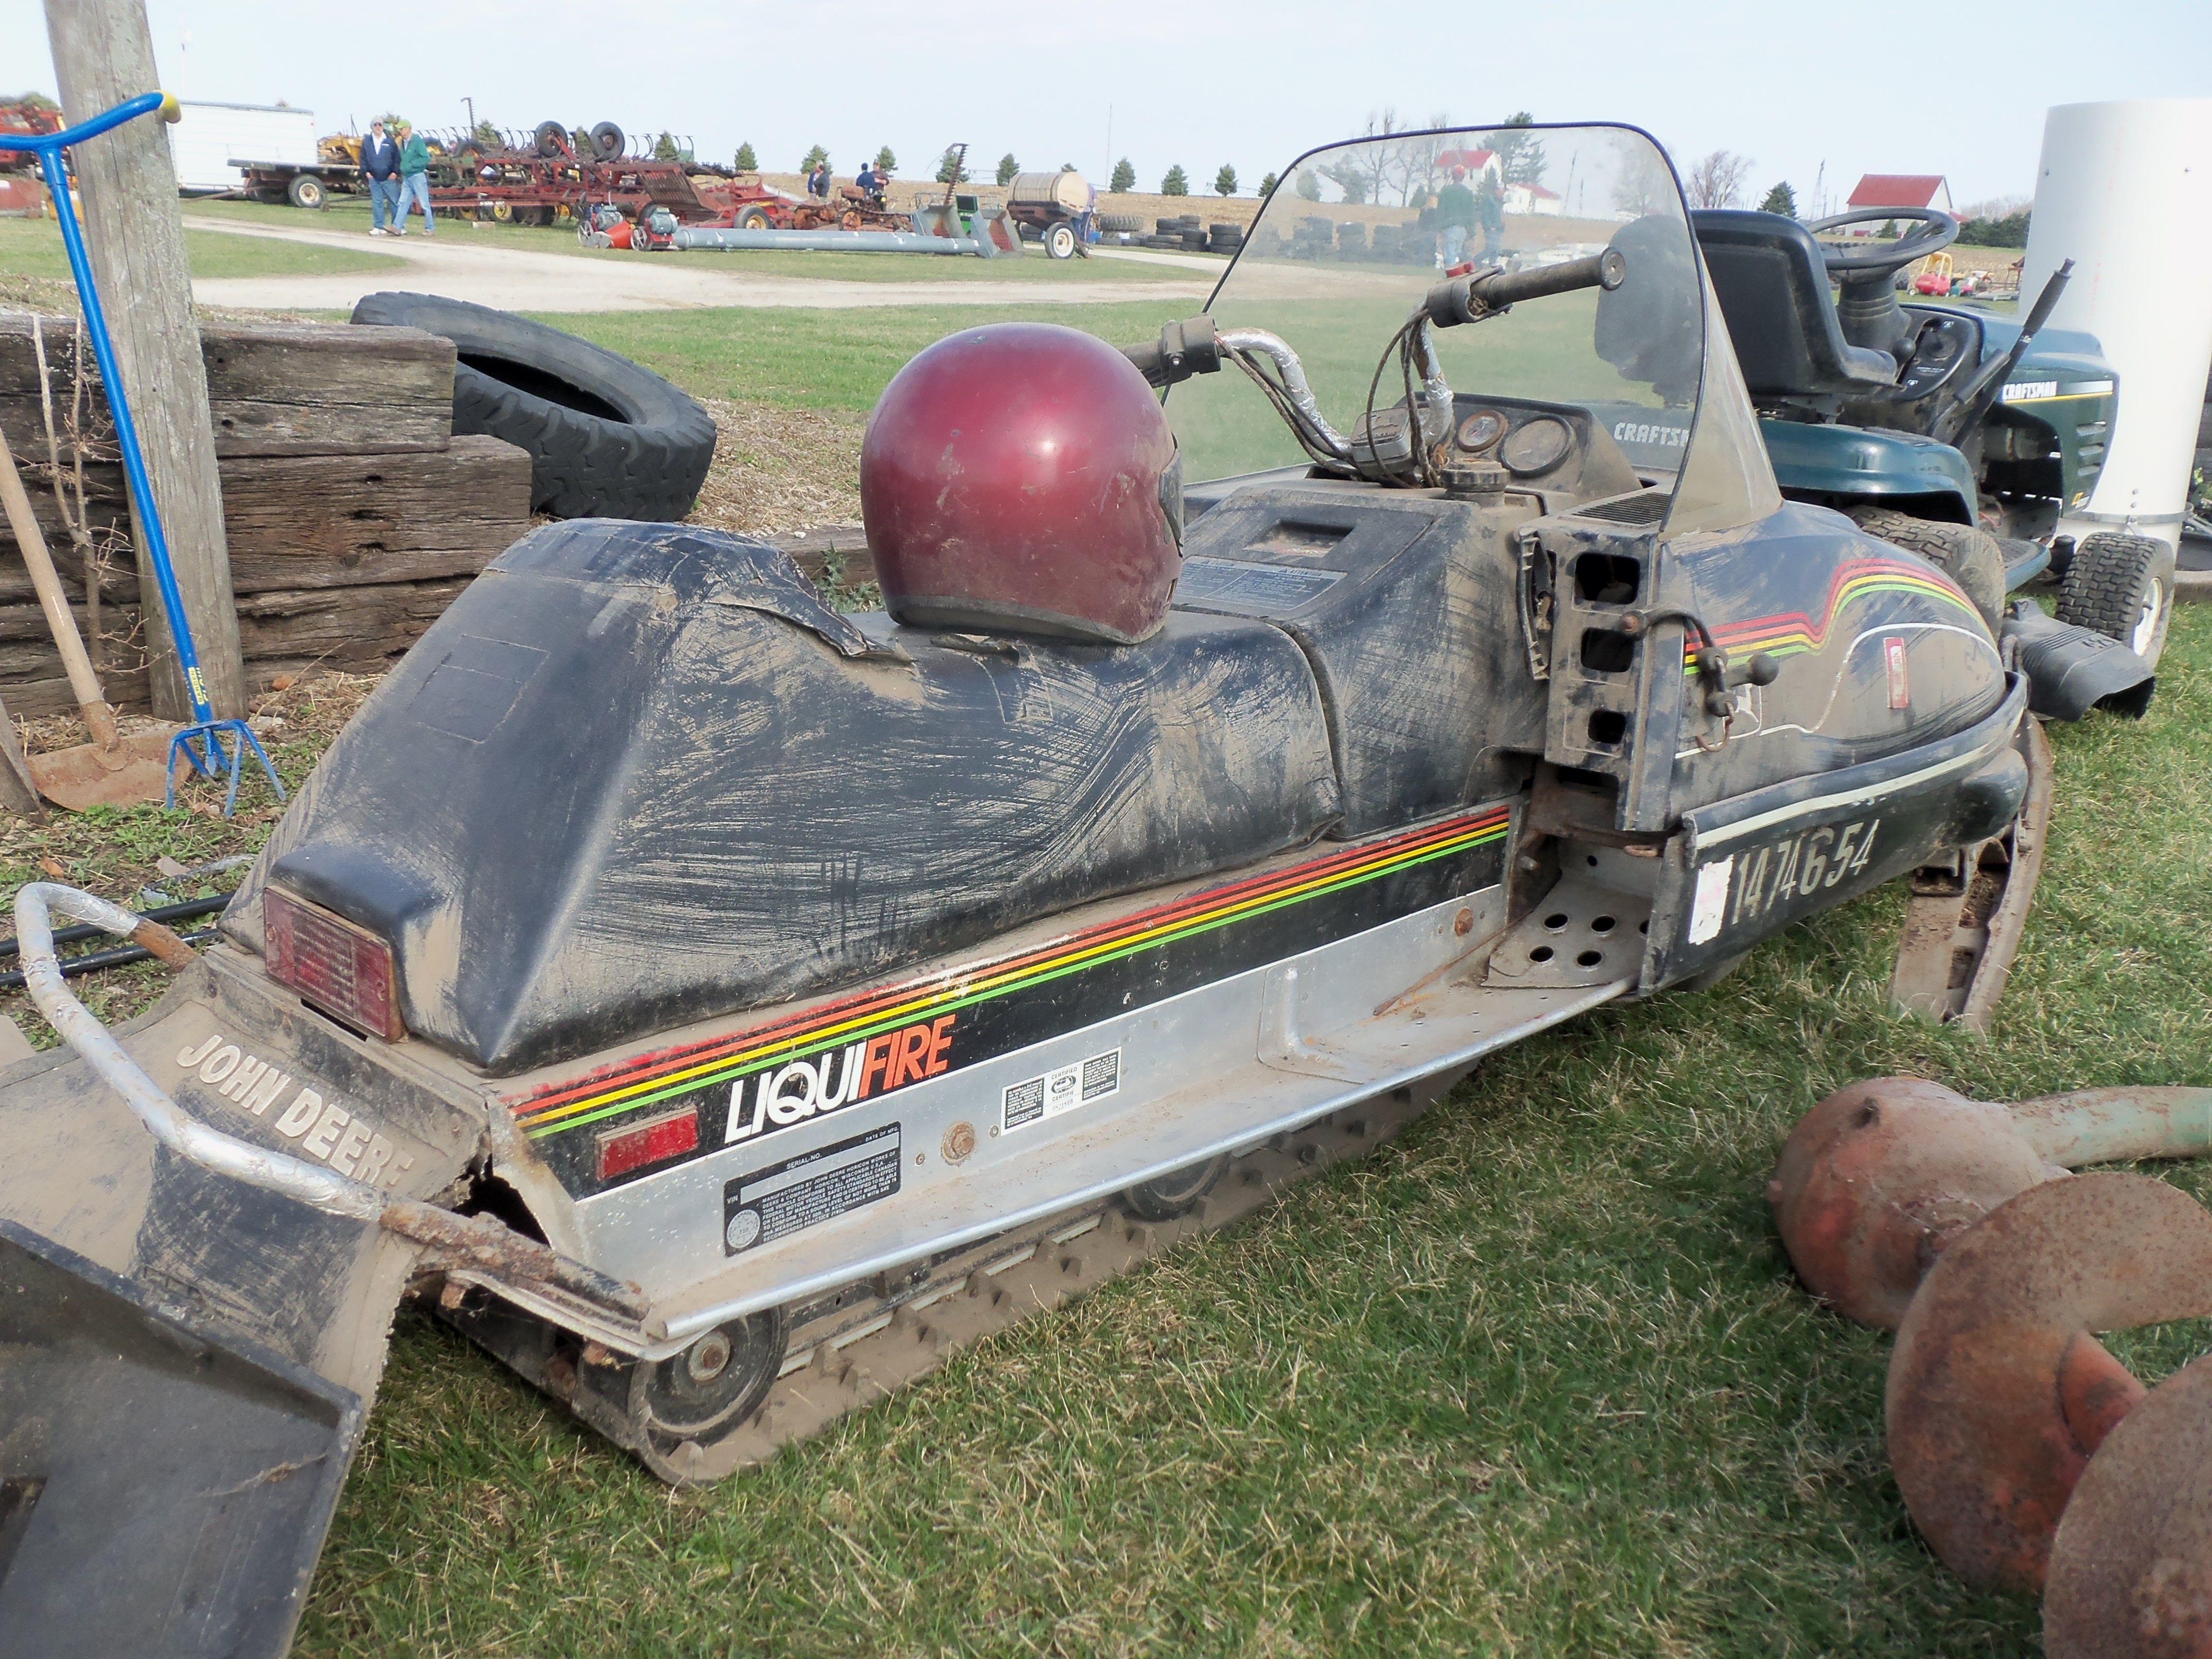 Used John Deere liquifire snowmobile